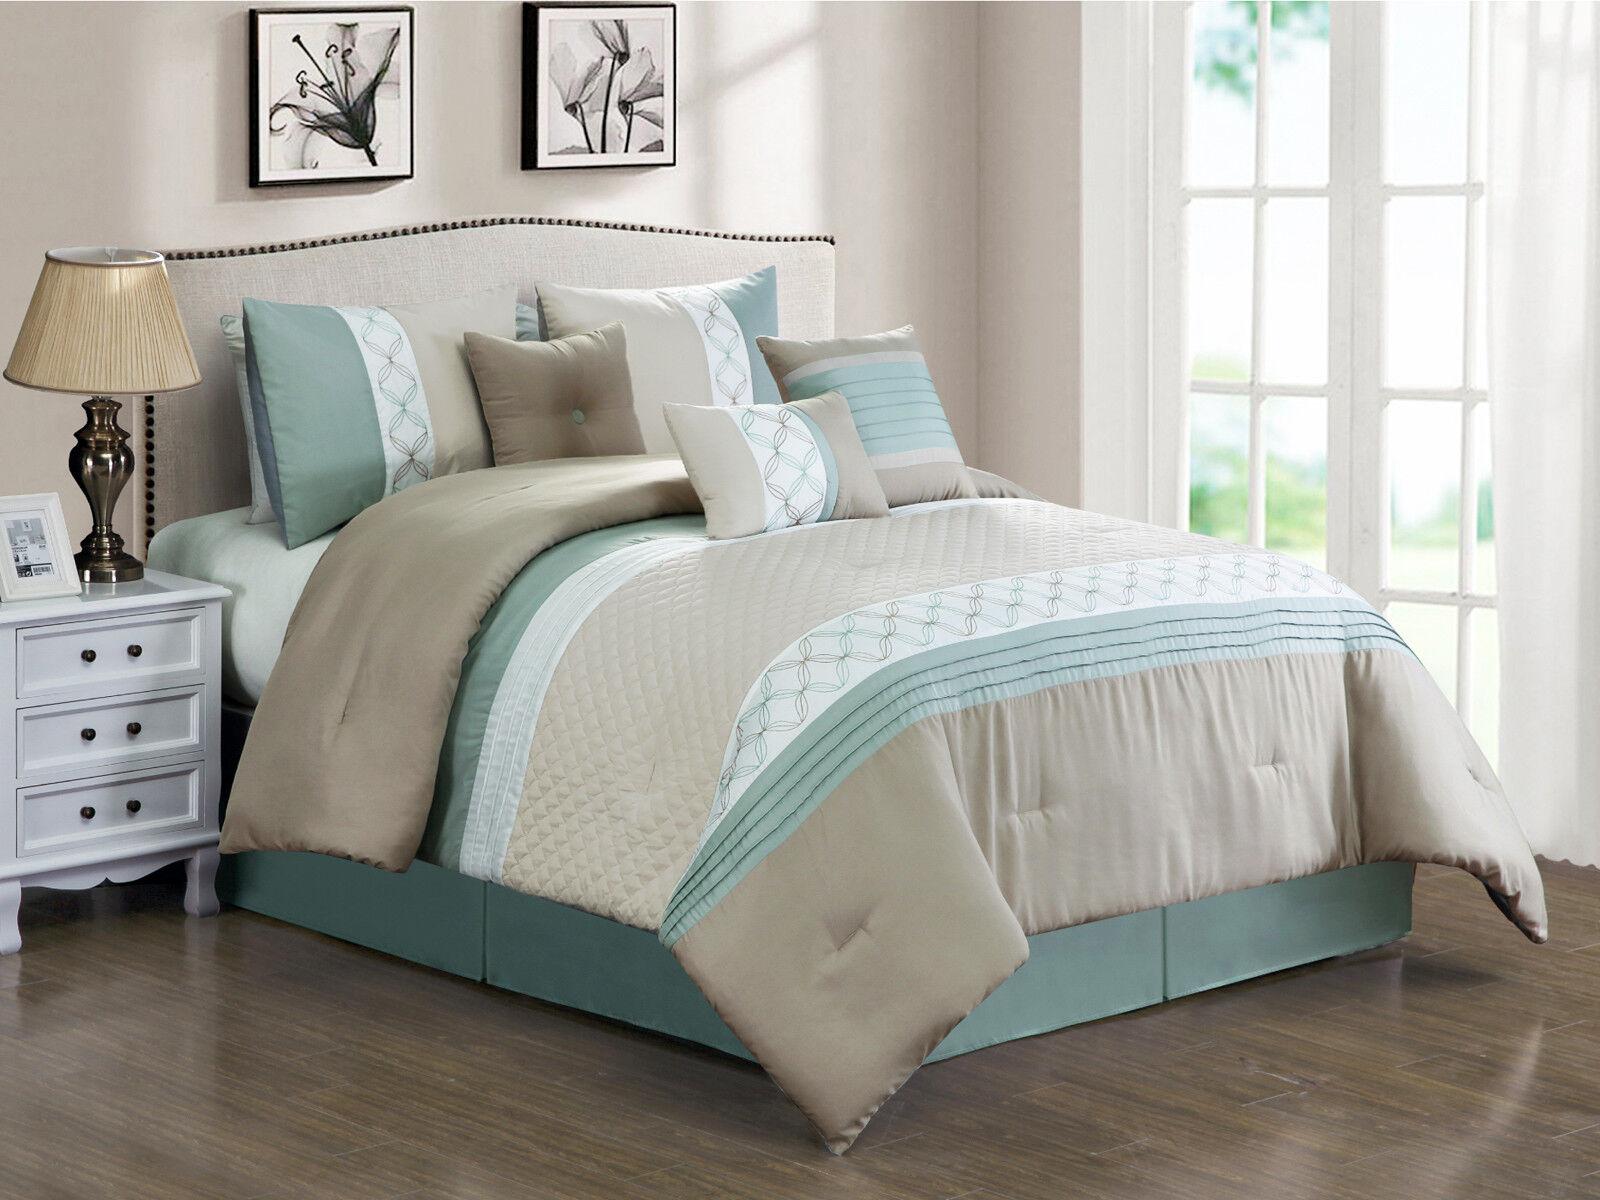 11P Llyr Clamshell Circle Star Comforter Curtain Set Taupe Beige Mint Weiß King